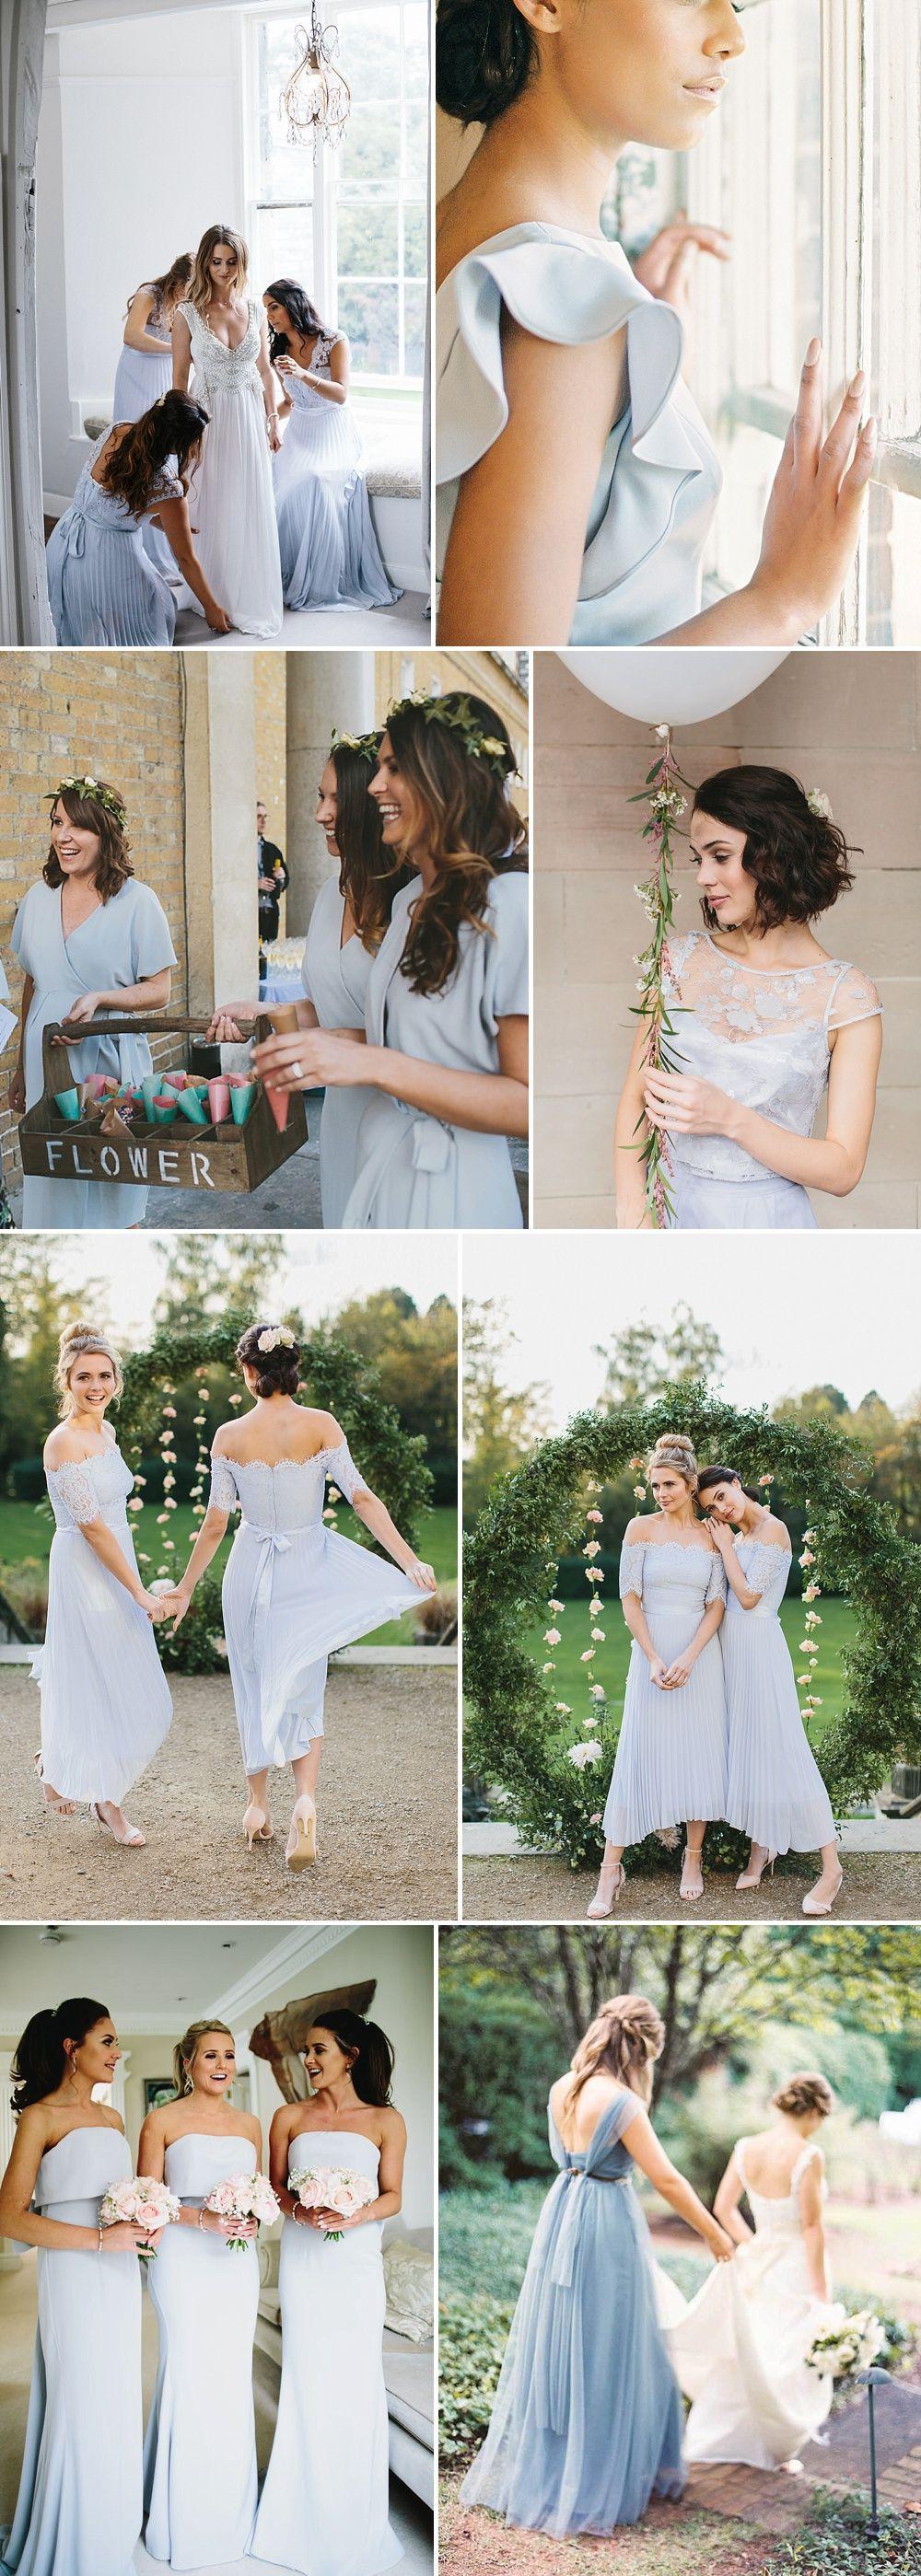 Spring bridesmaids dresses sherbet lemon and powder blue